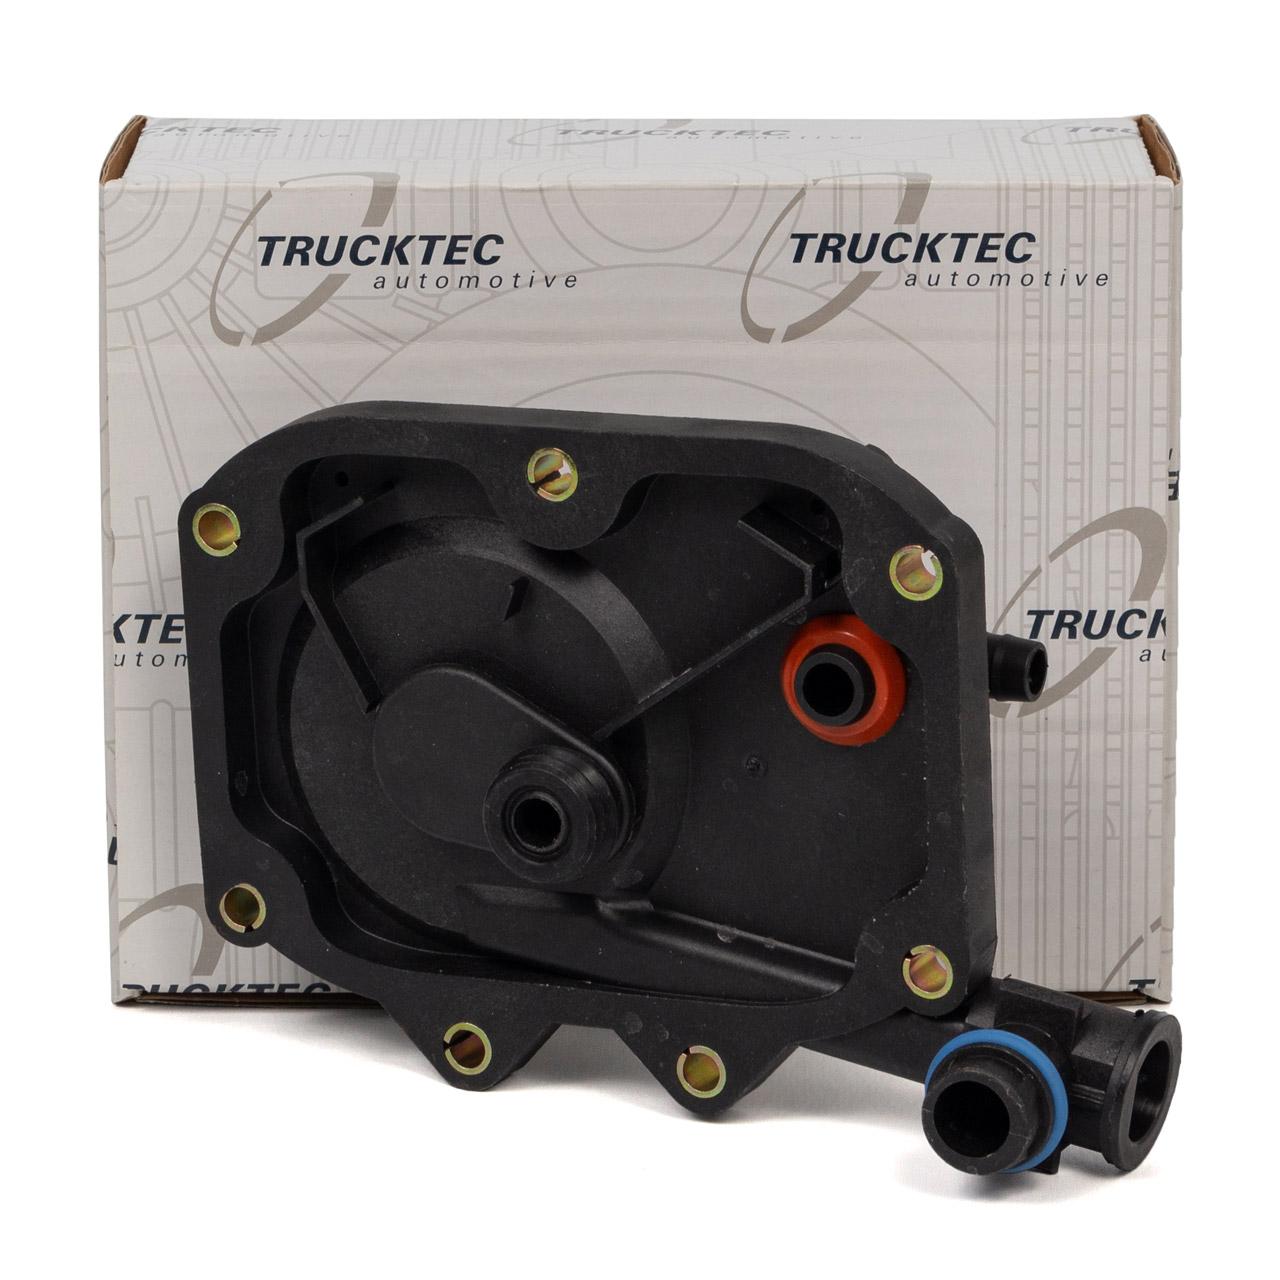 TRUCKTEC Verstelleinheit Luftsteuerung BMW 5er E39 535i 540i 7er E38 735i 740i 11617501563